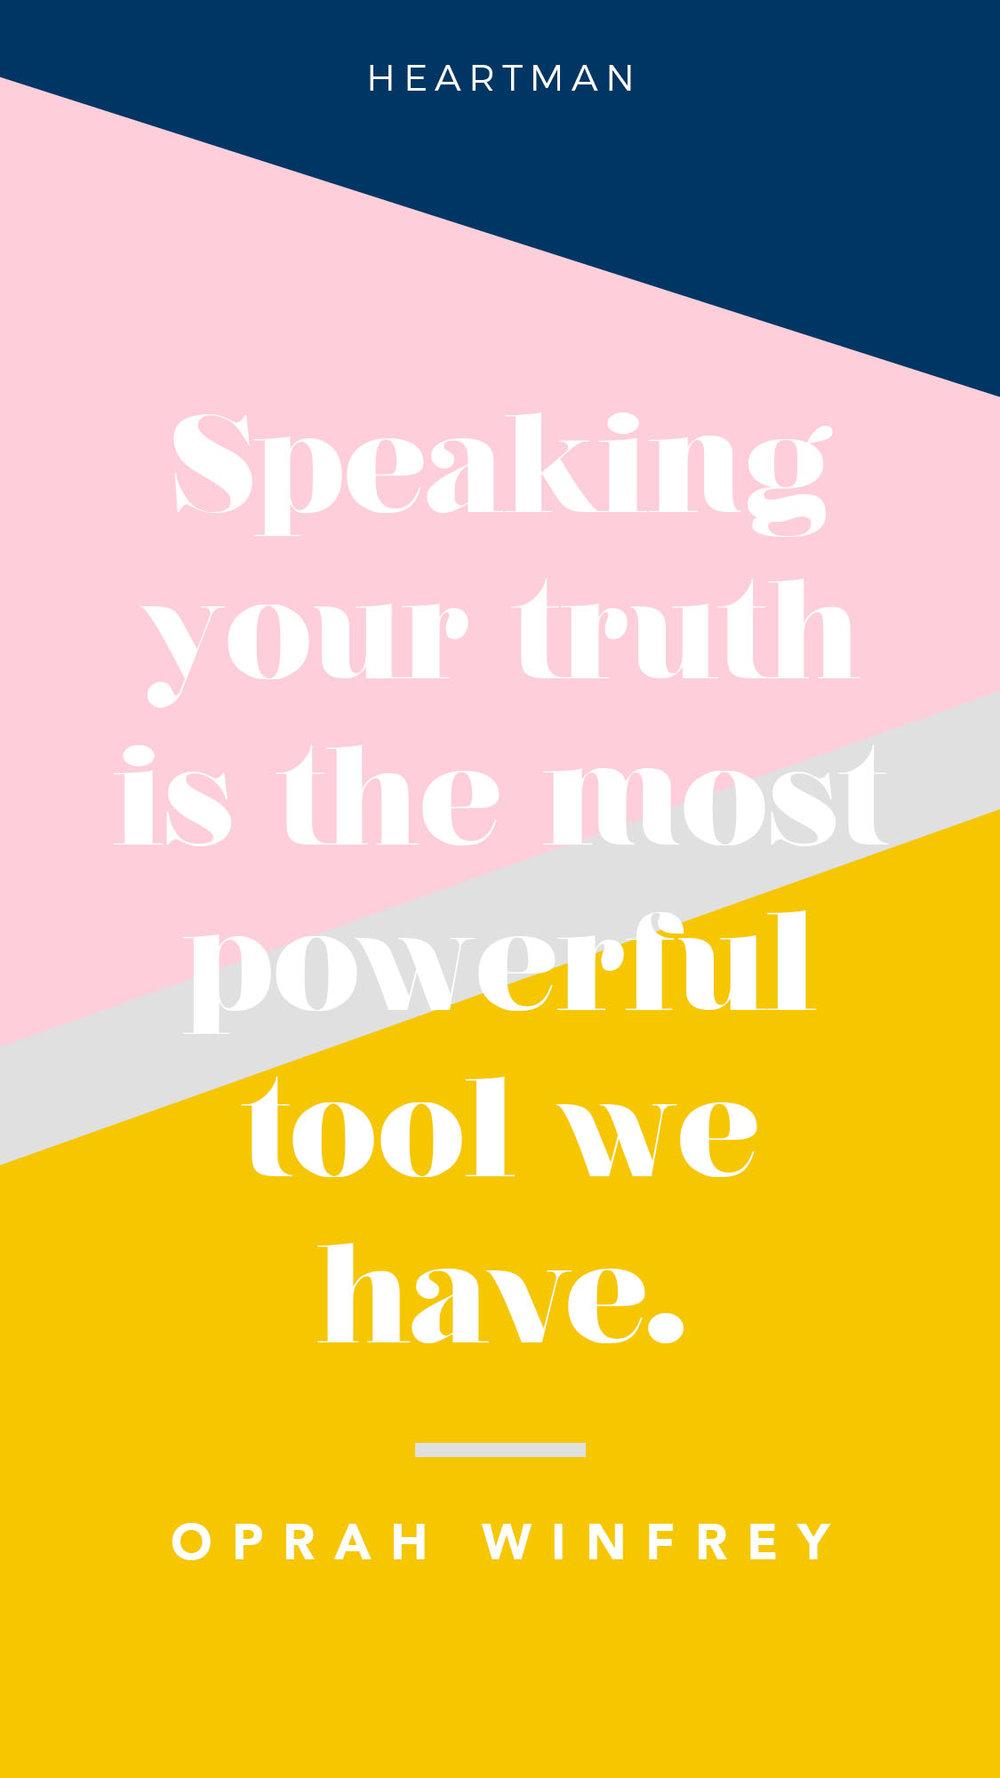 oprah-truth.jpg